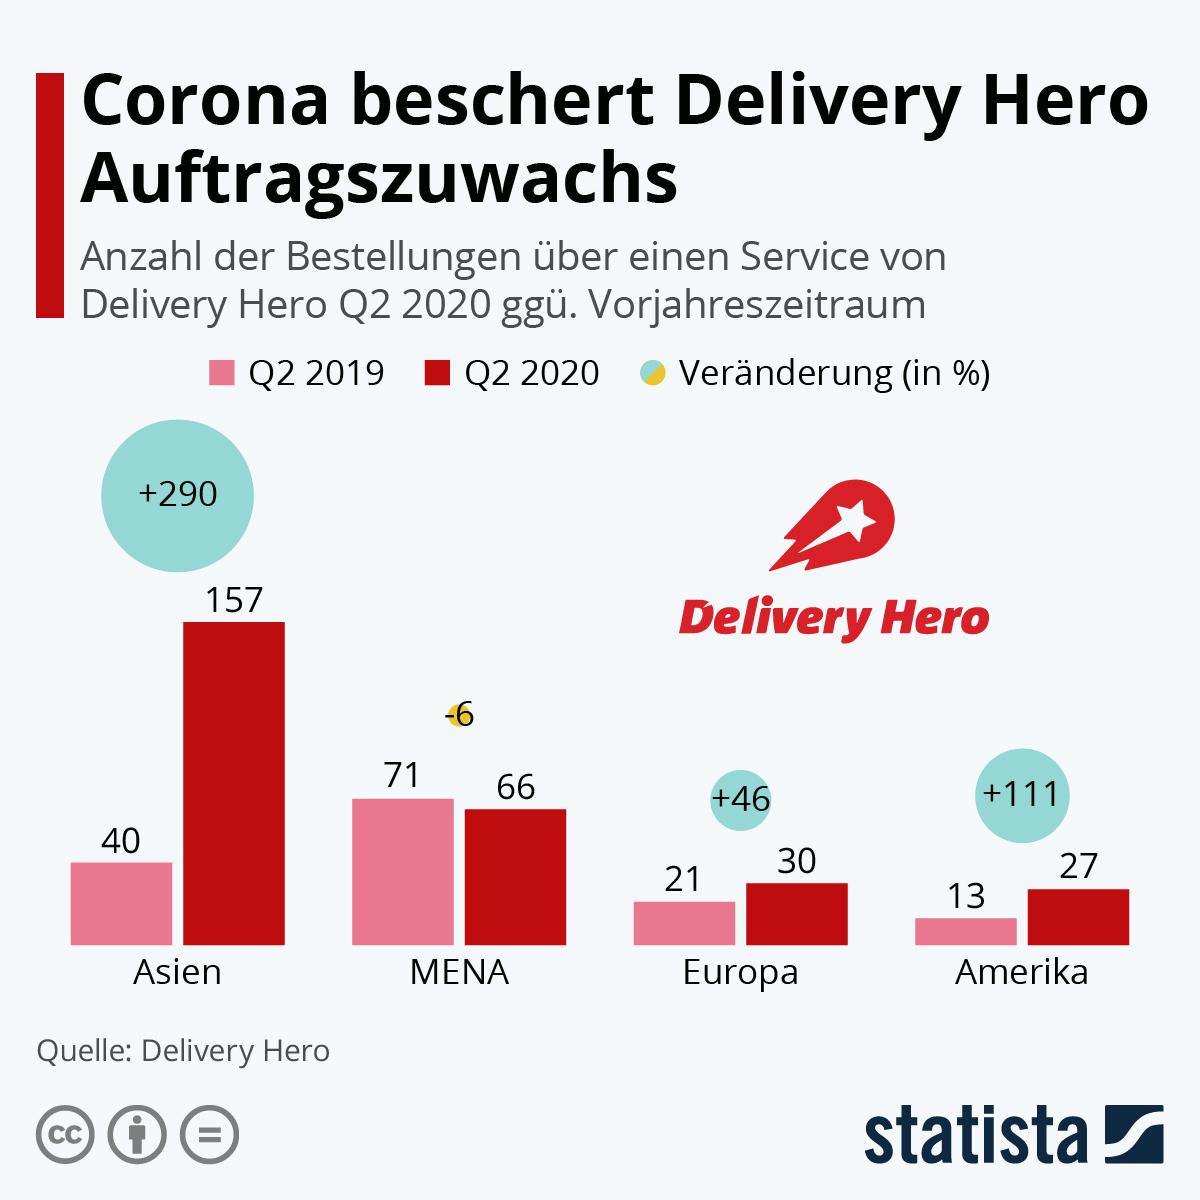 Infografik: Corona beschert Delivery Hero Auftragszuwachs | Statista